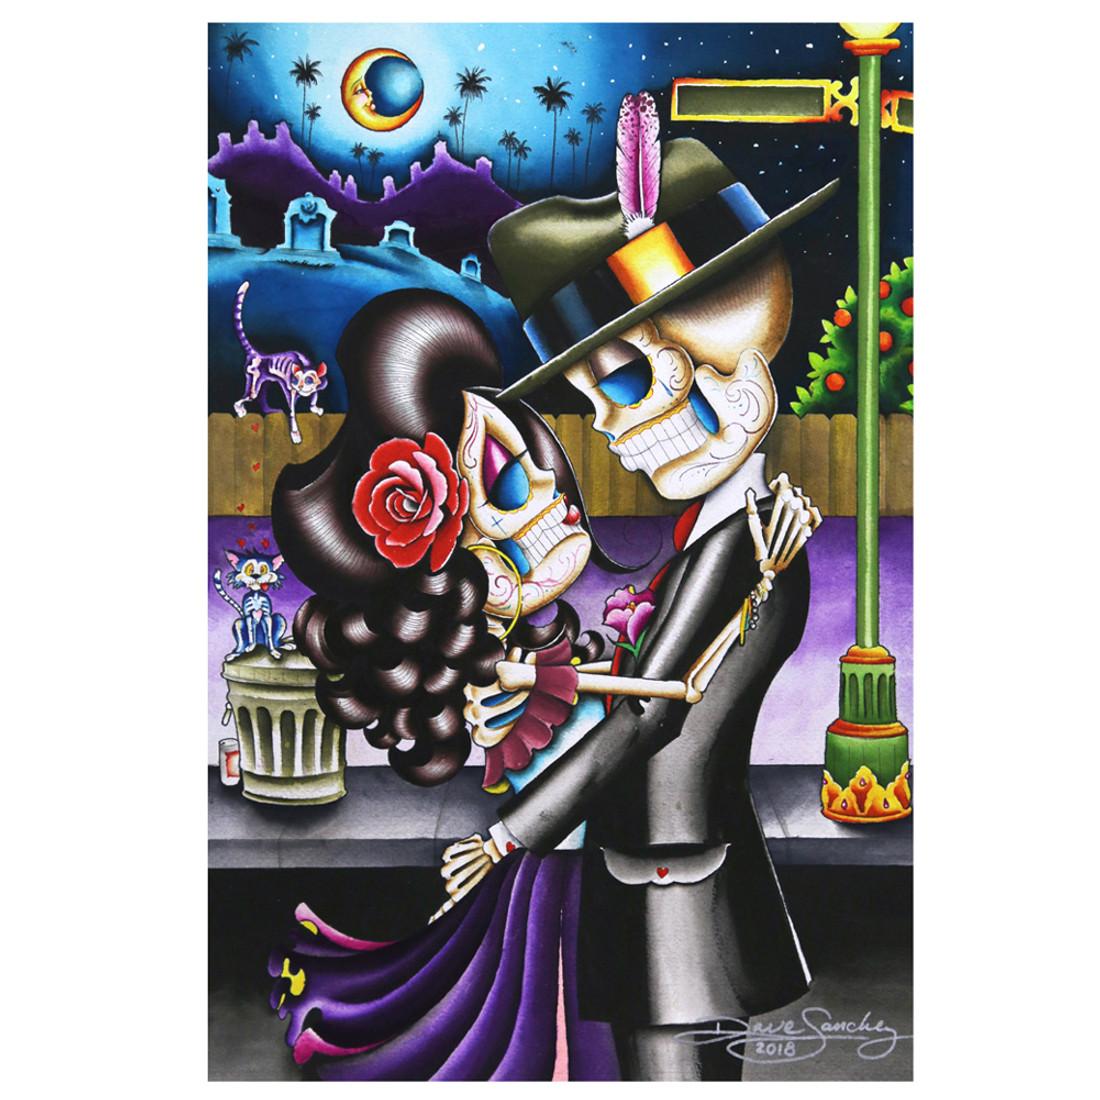 Gracias Mi Amor by Dave Sanchez Tattoo Art Print Day of the Dead Sugar Skull